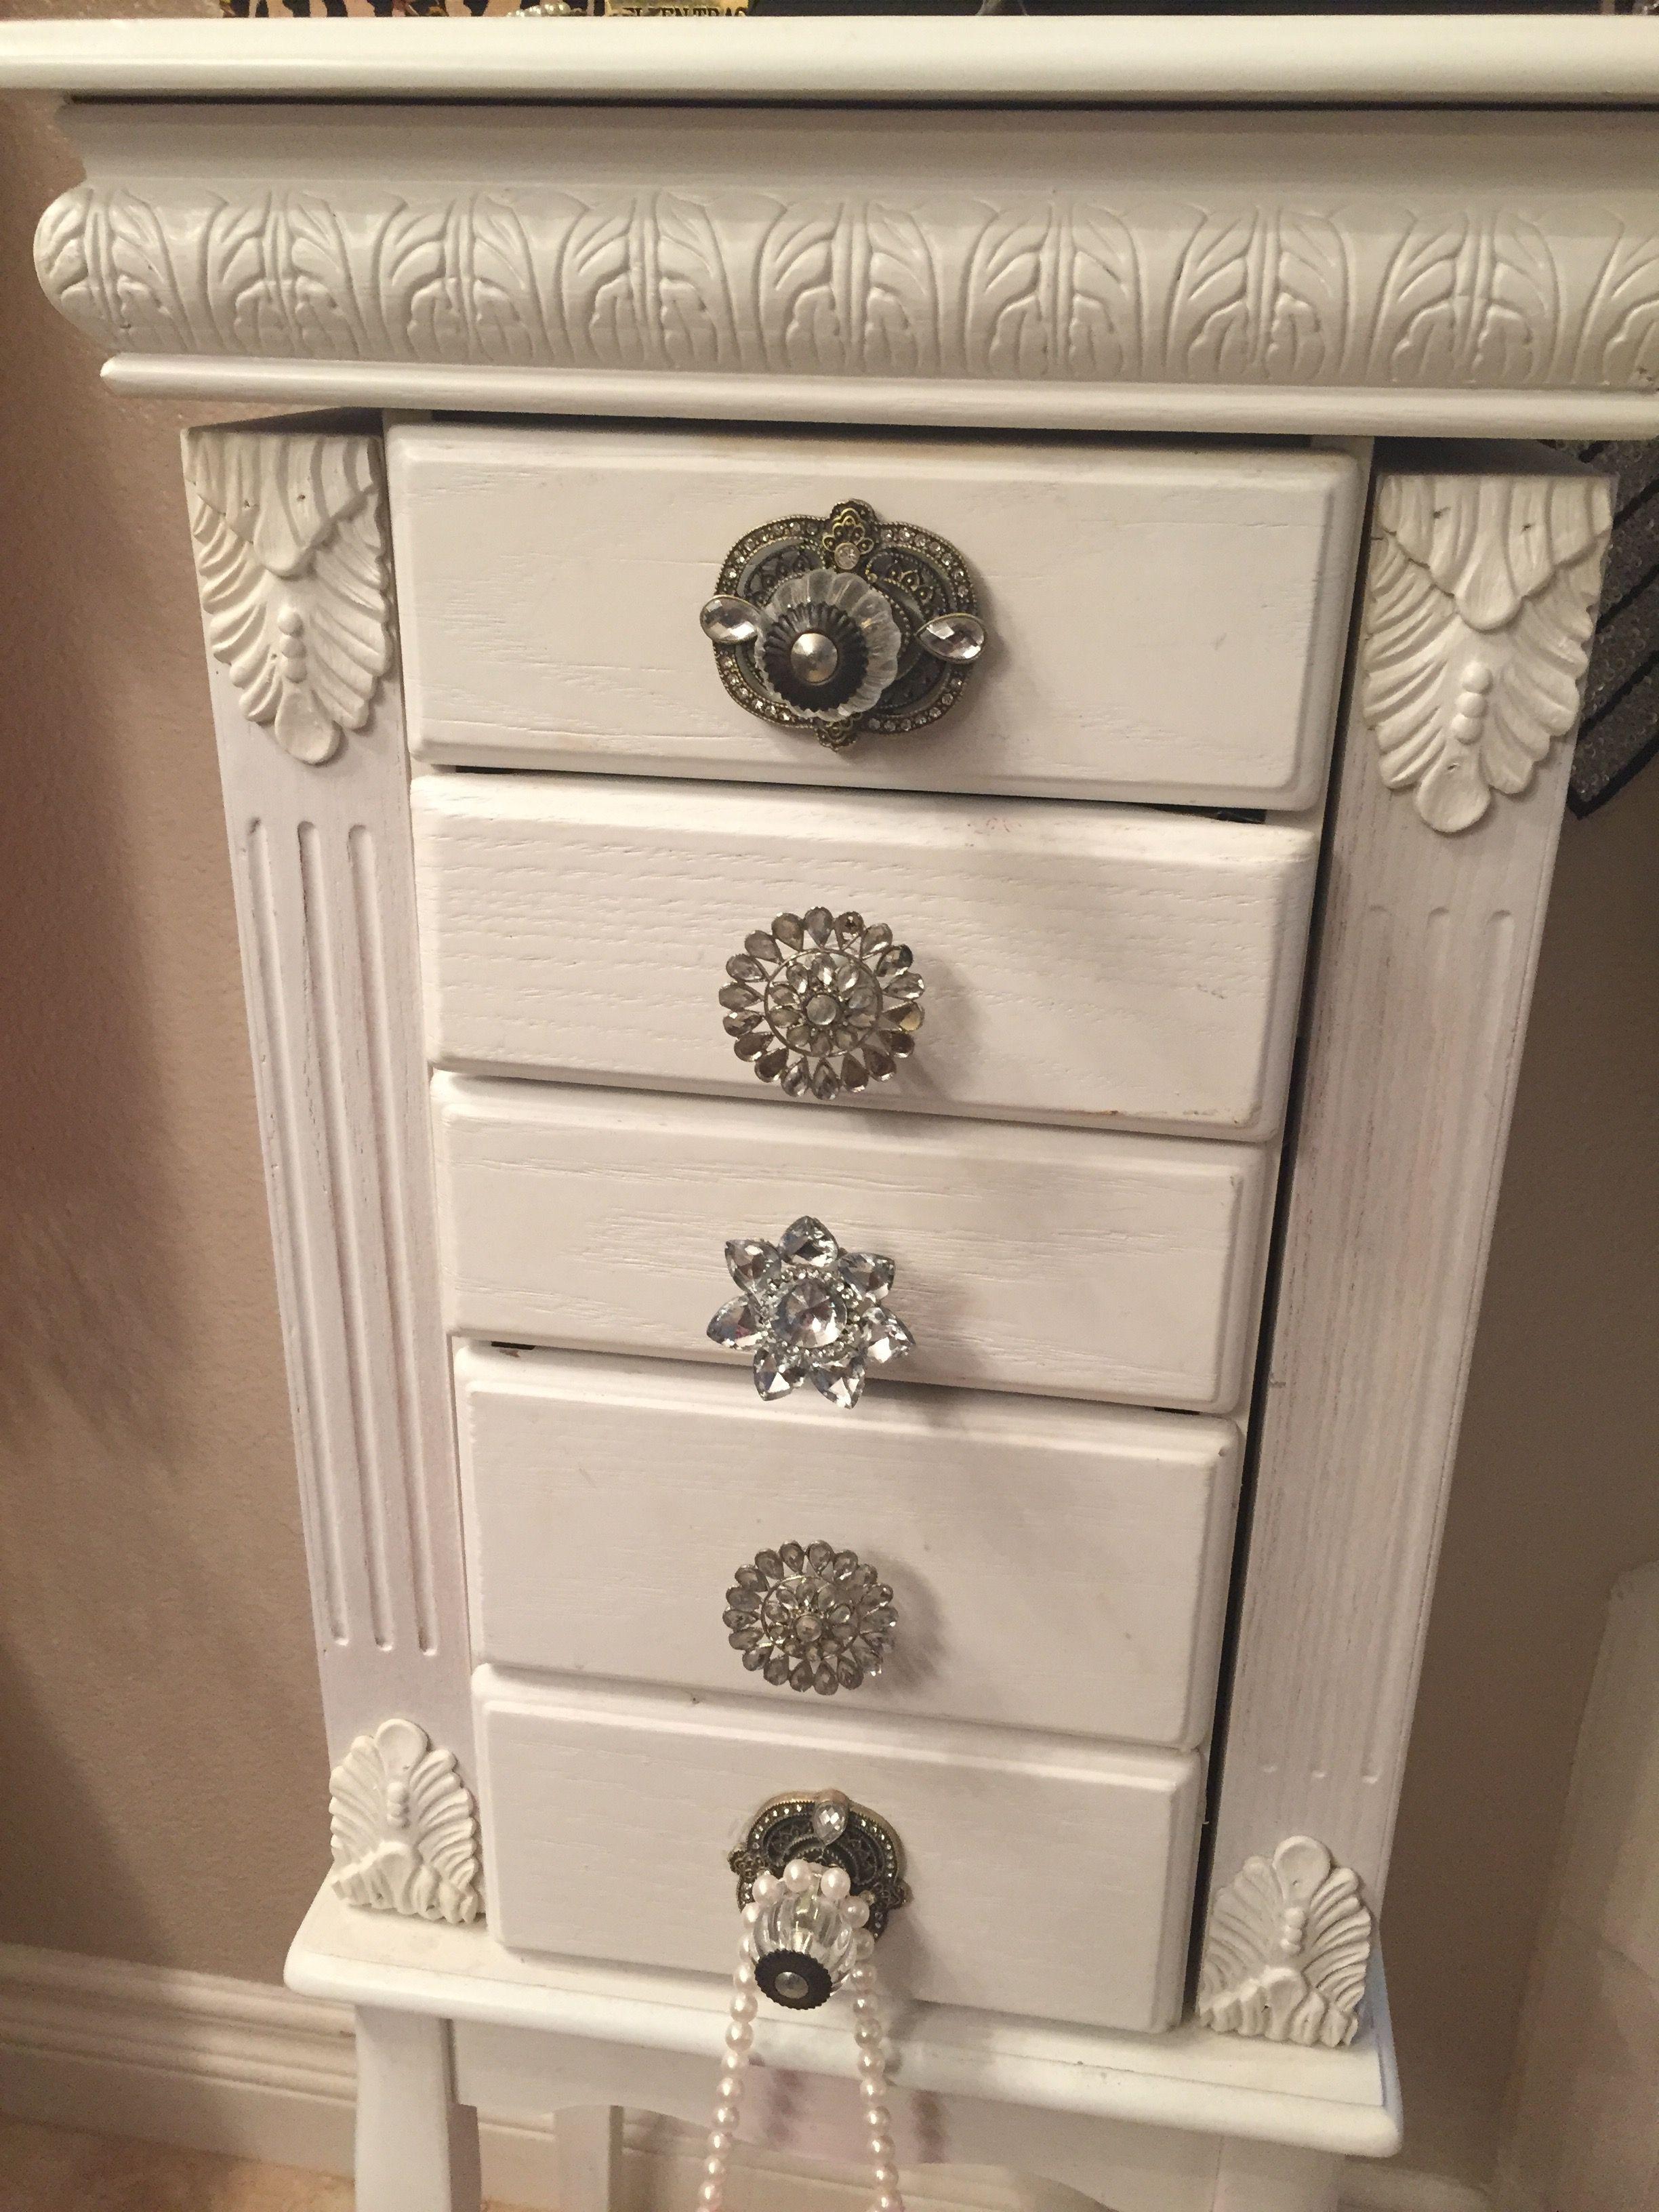 My jewelry box i added beautiful knobs from hobby lobby